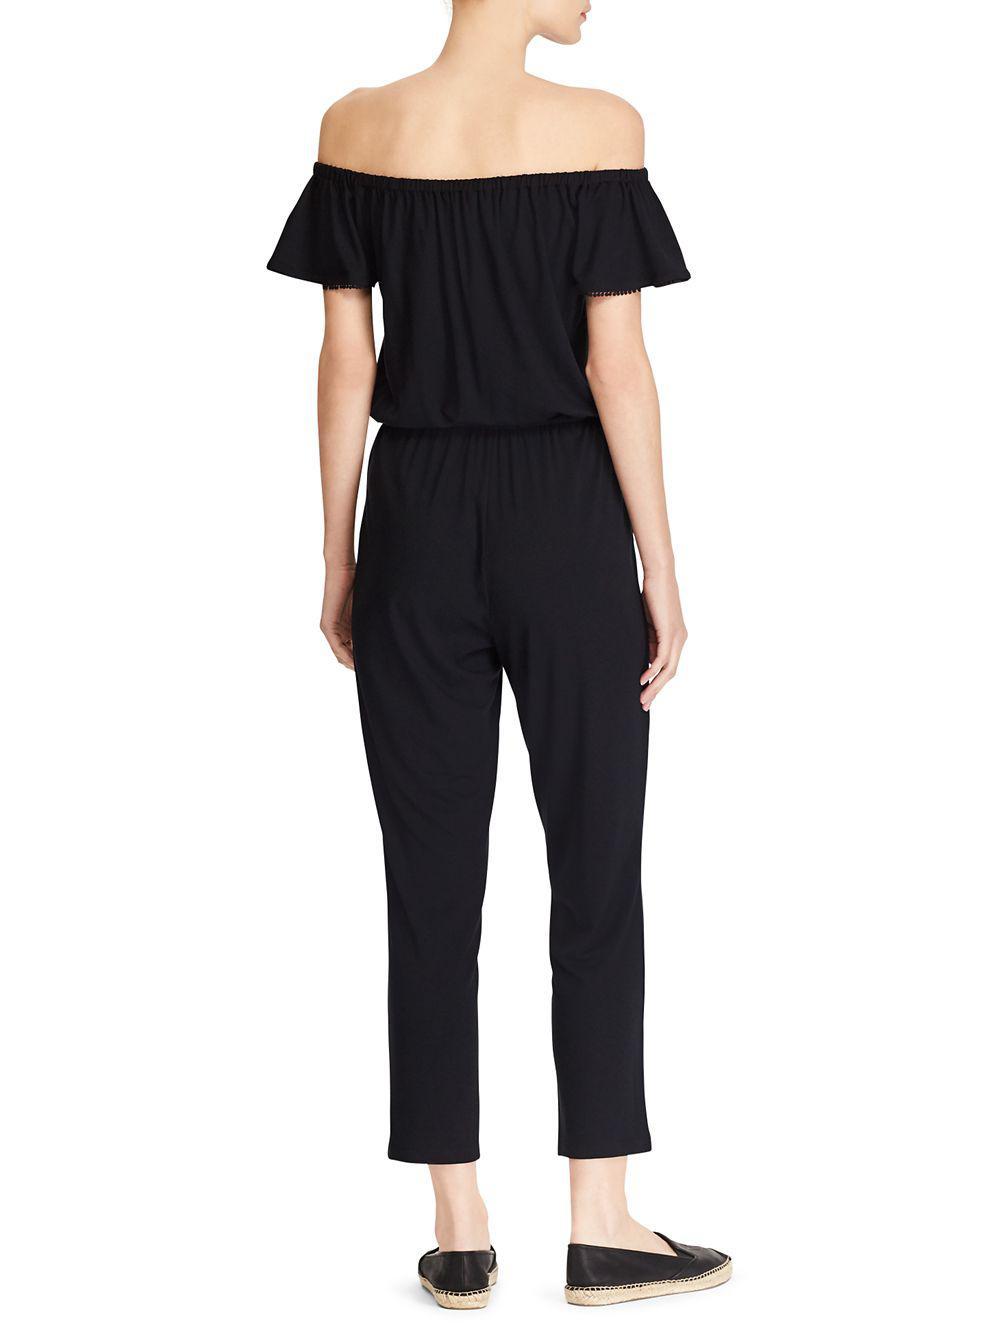 0127c977fa97 Lyst - Lauren By Ralph Lauren Off-the-shoulder Jumpsuit in Black